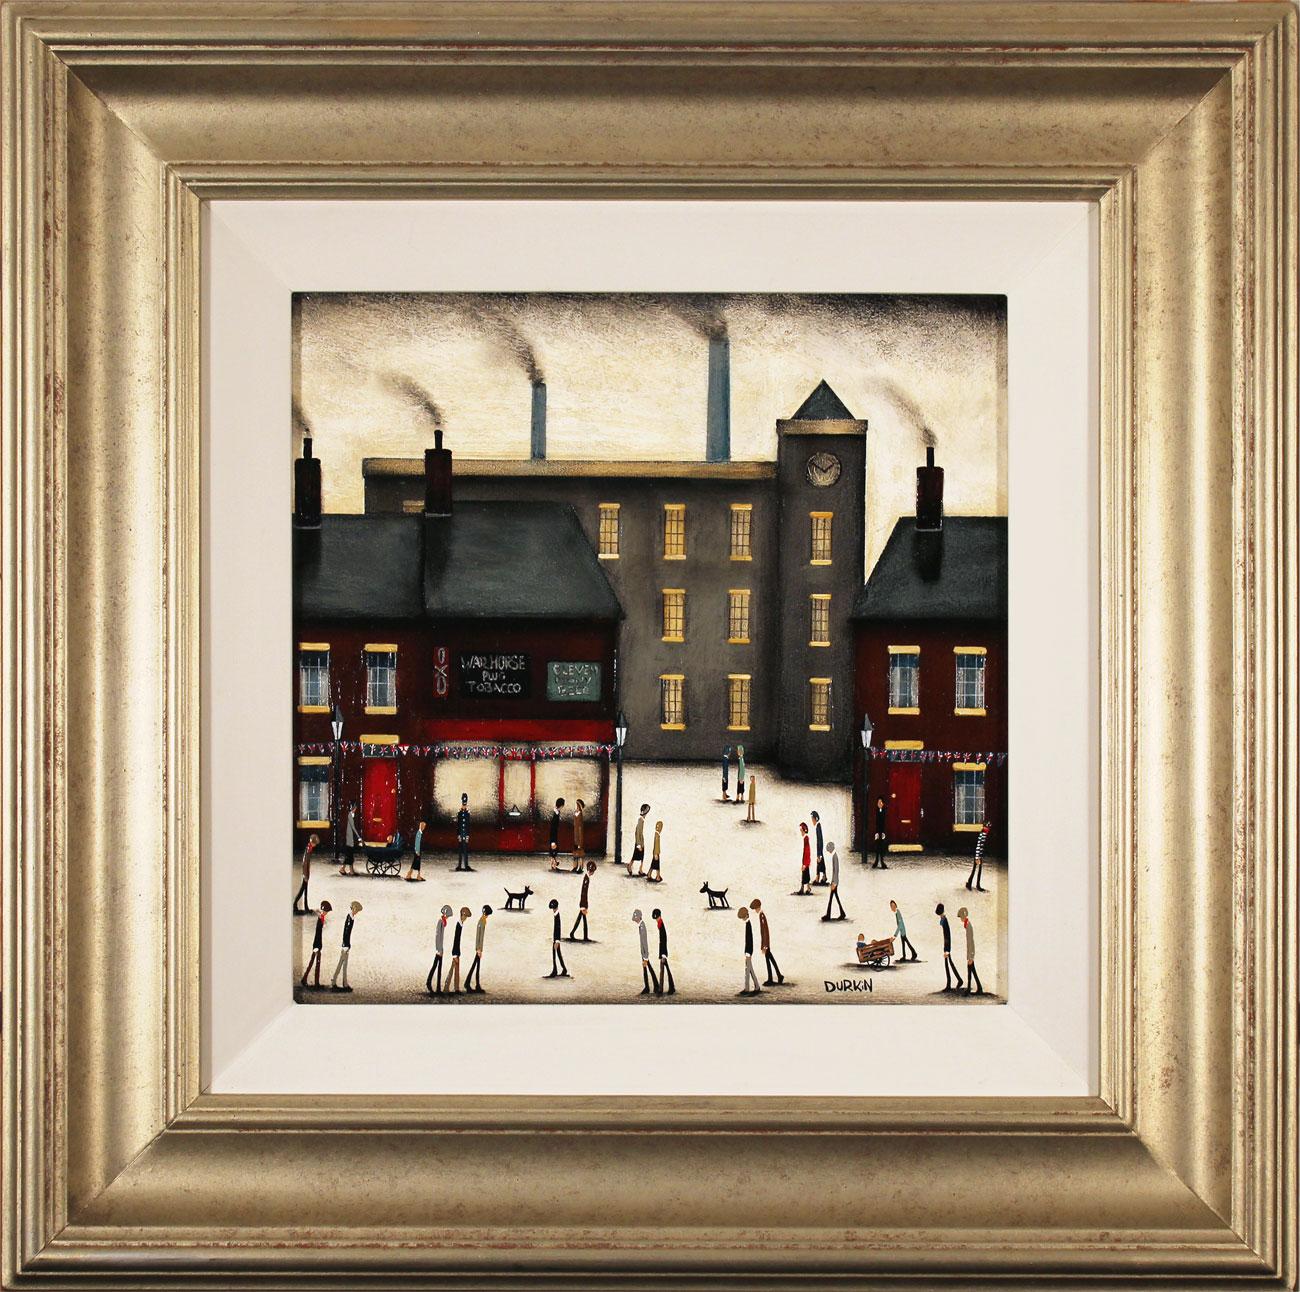 Sean Durkin, Original oil painting on panel, Factory Corner. Click to enlarge